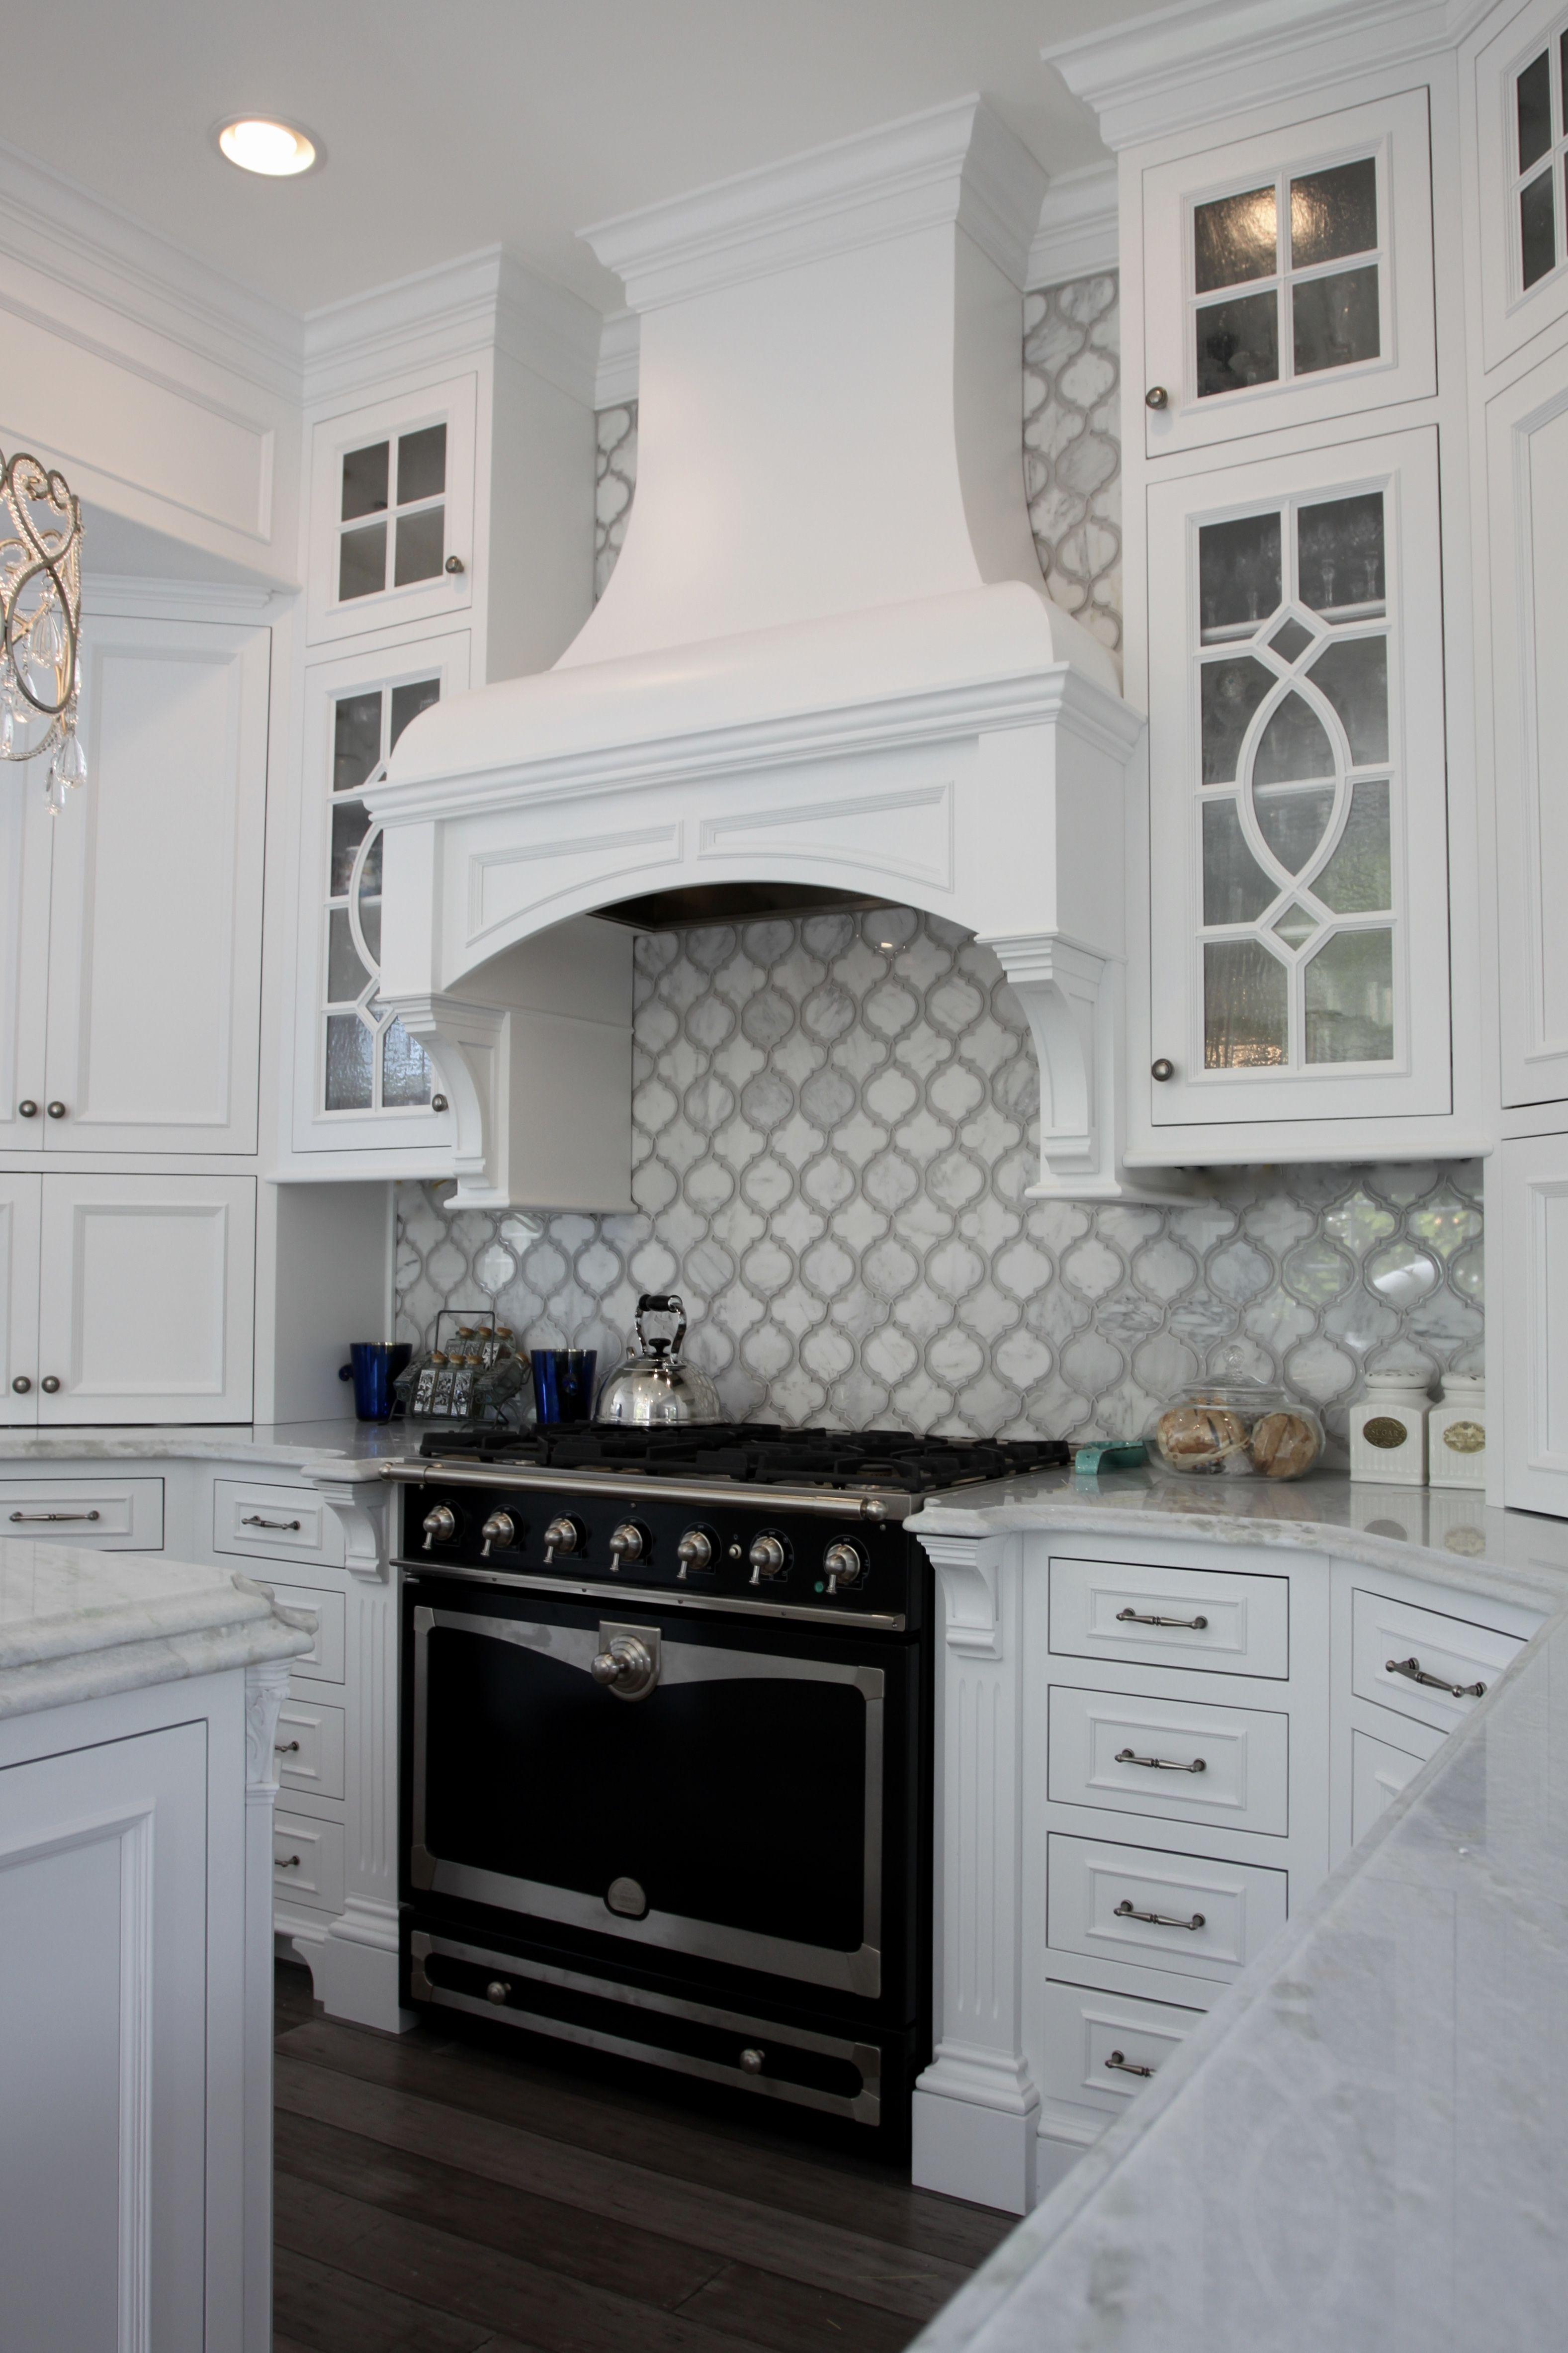 Custom Wood Hood With Images Kitchen Backsplash Designs